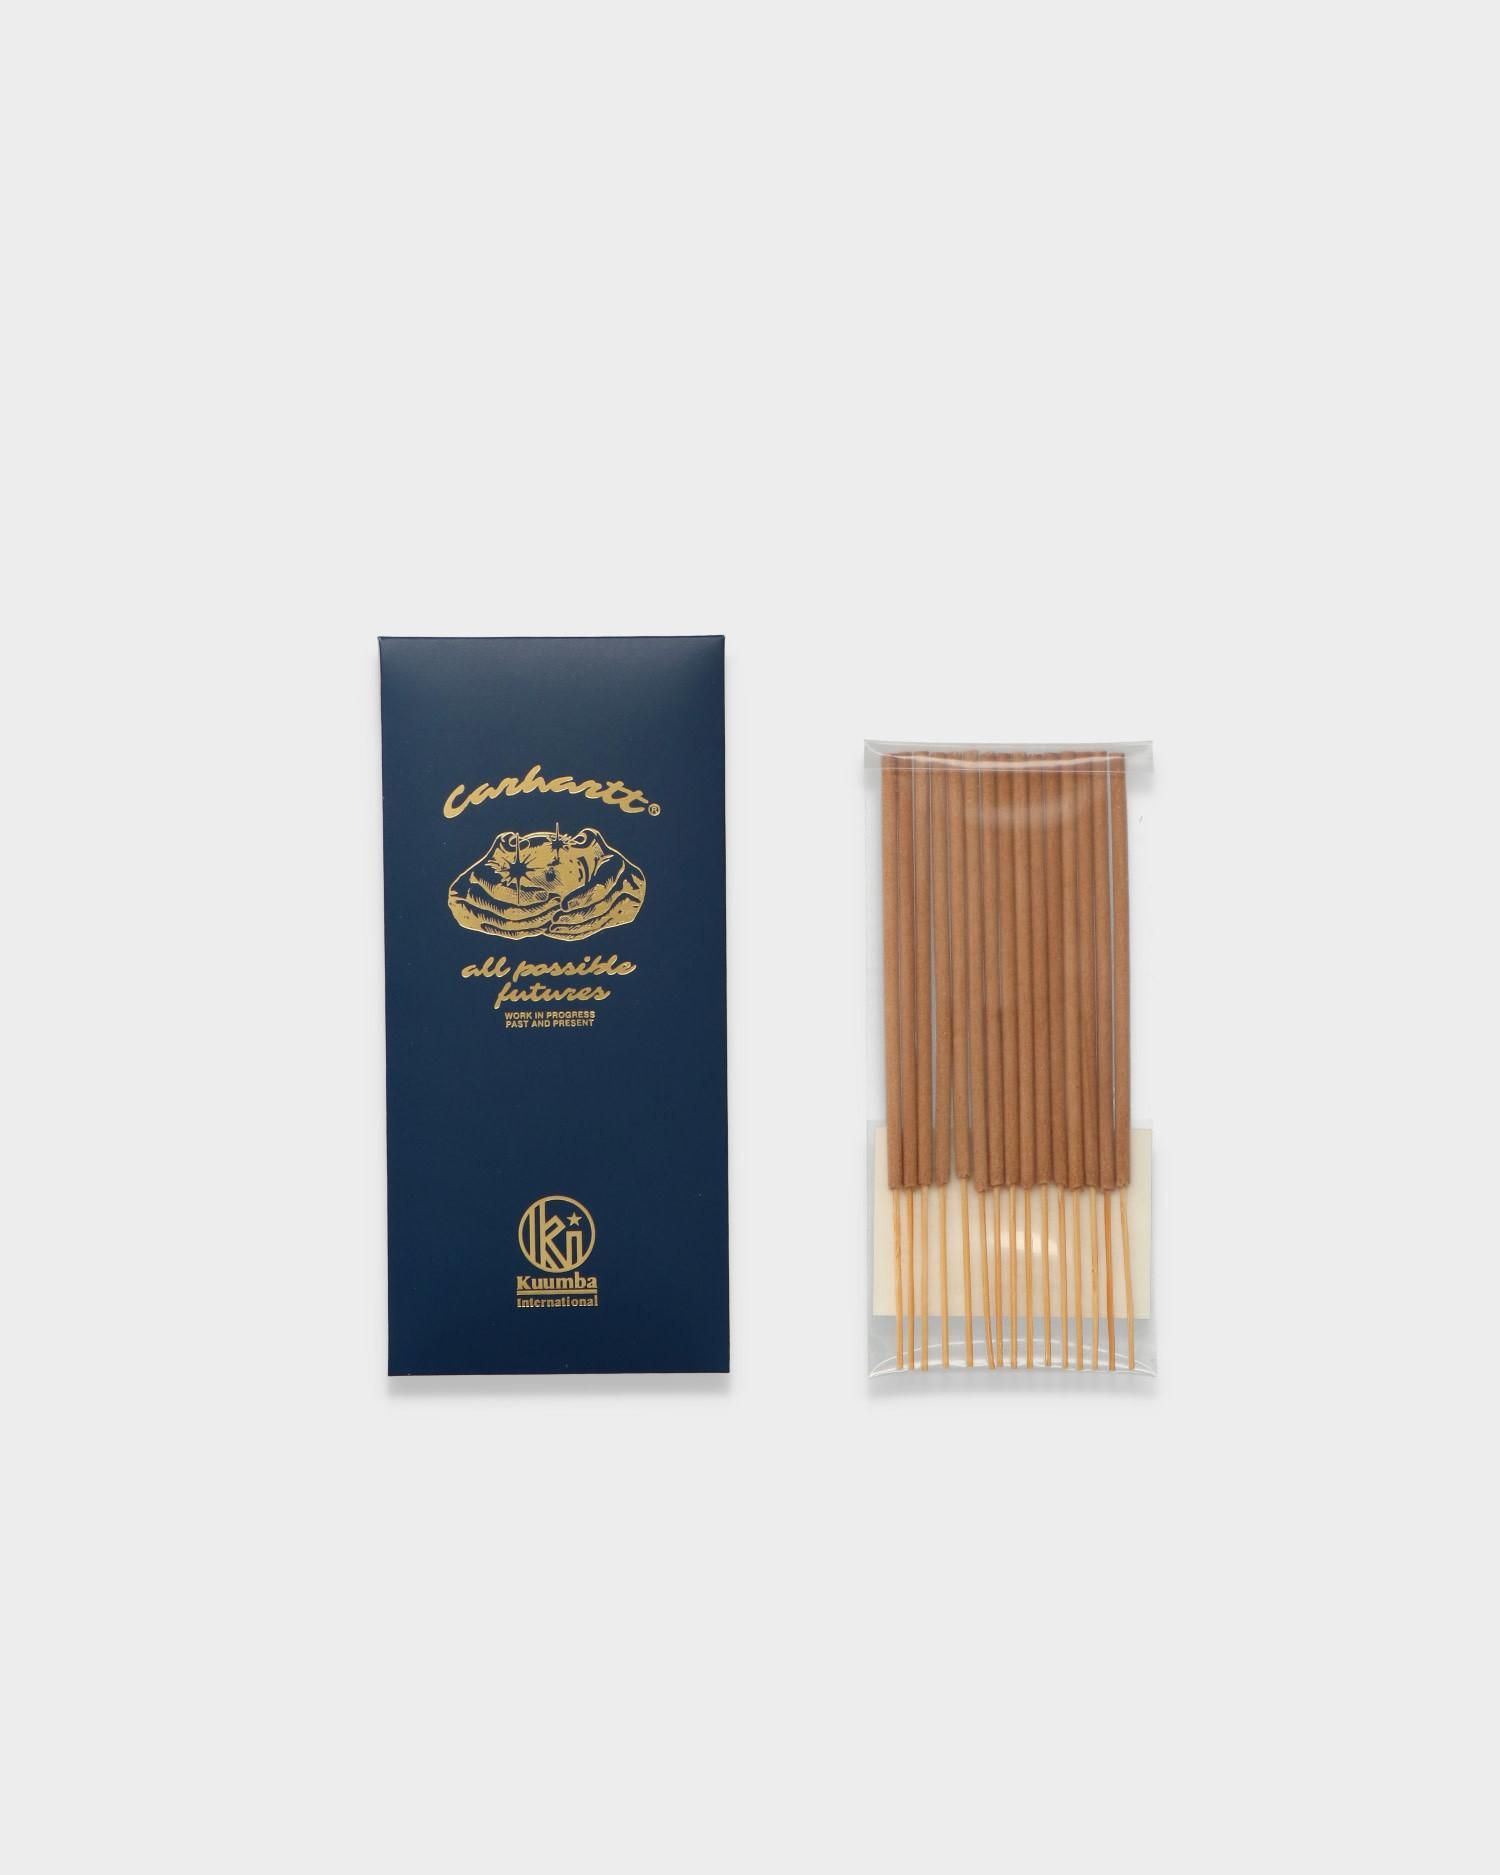 Carhartt WIP X Kuumba Mini-fortune Incense sticks